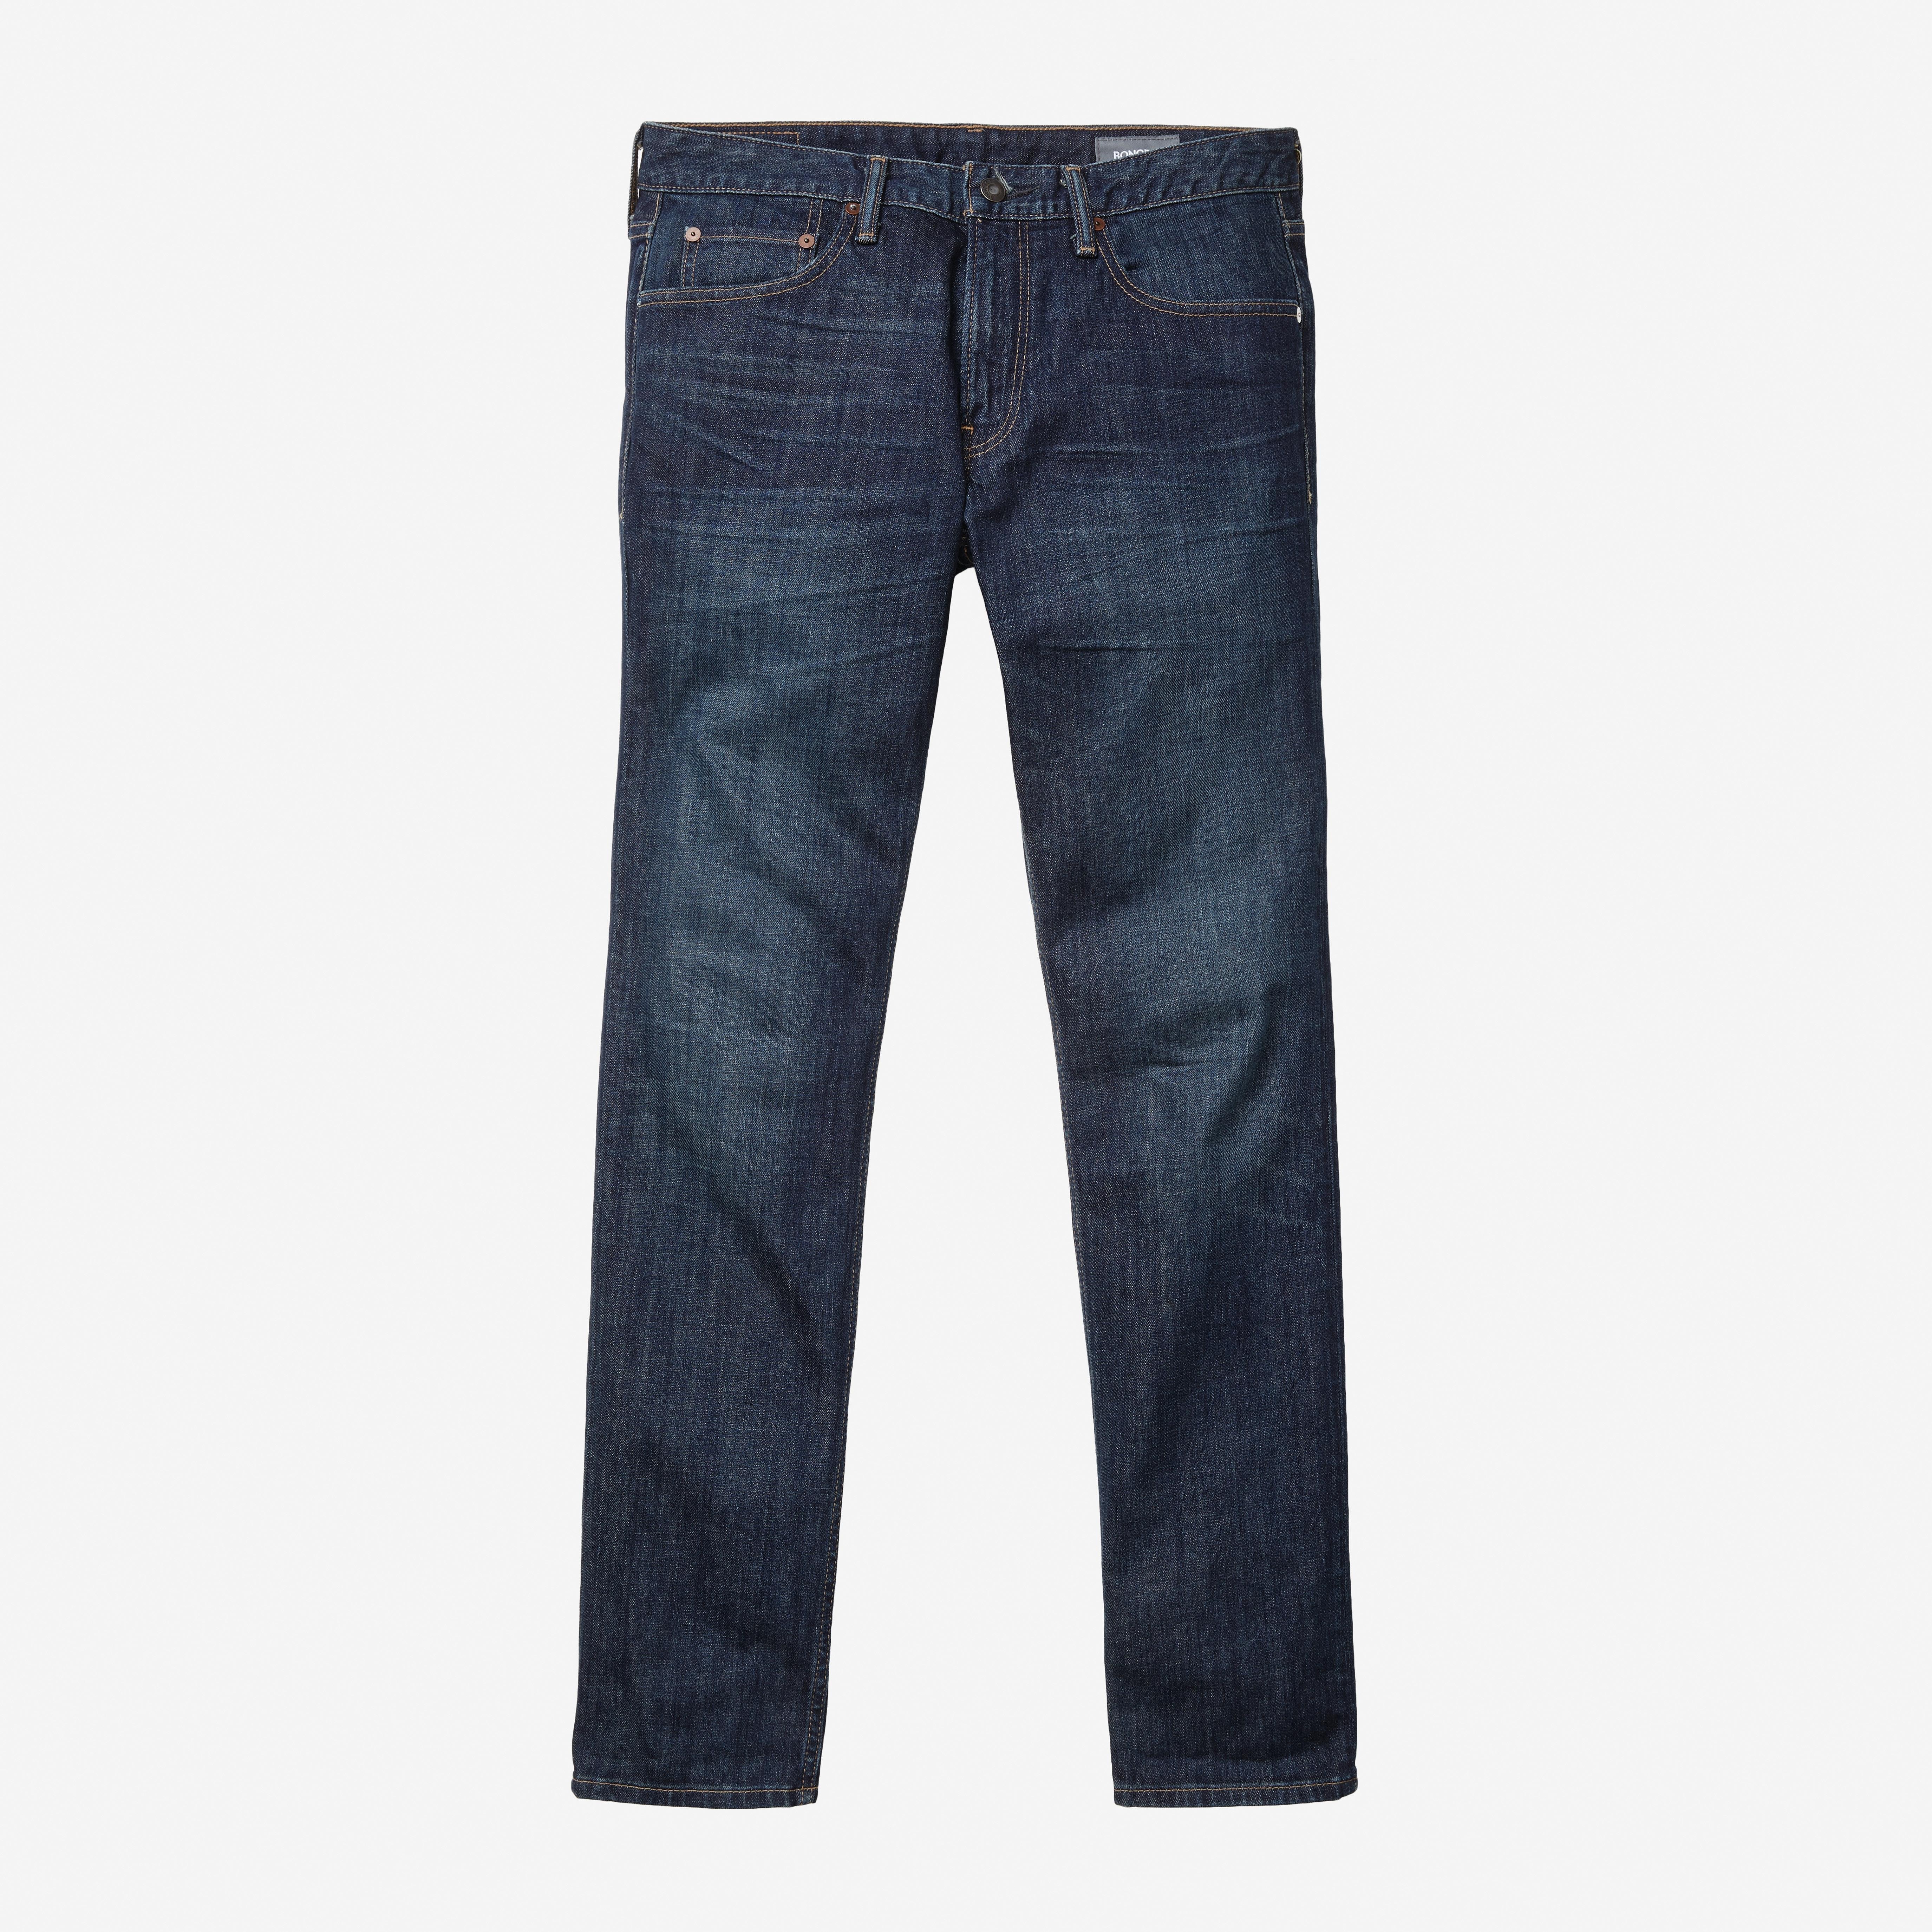 Blue Jean - Bootcut